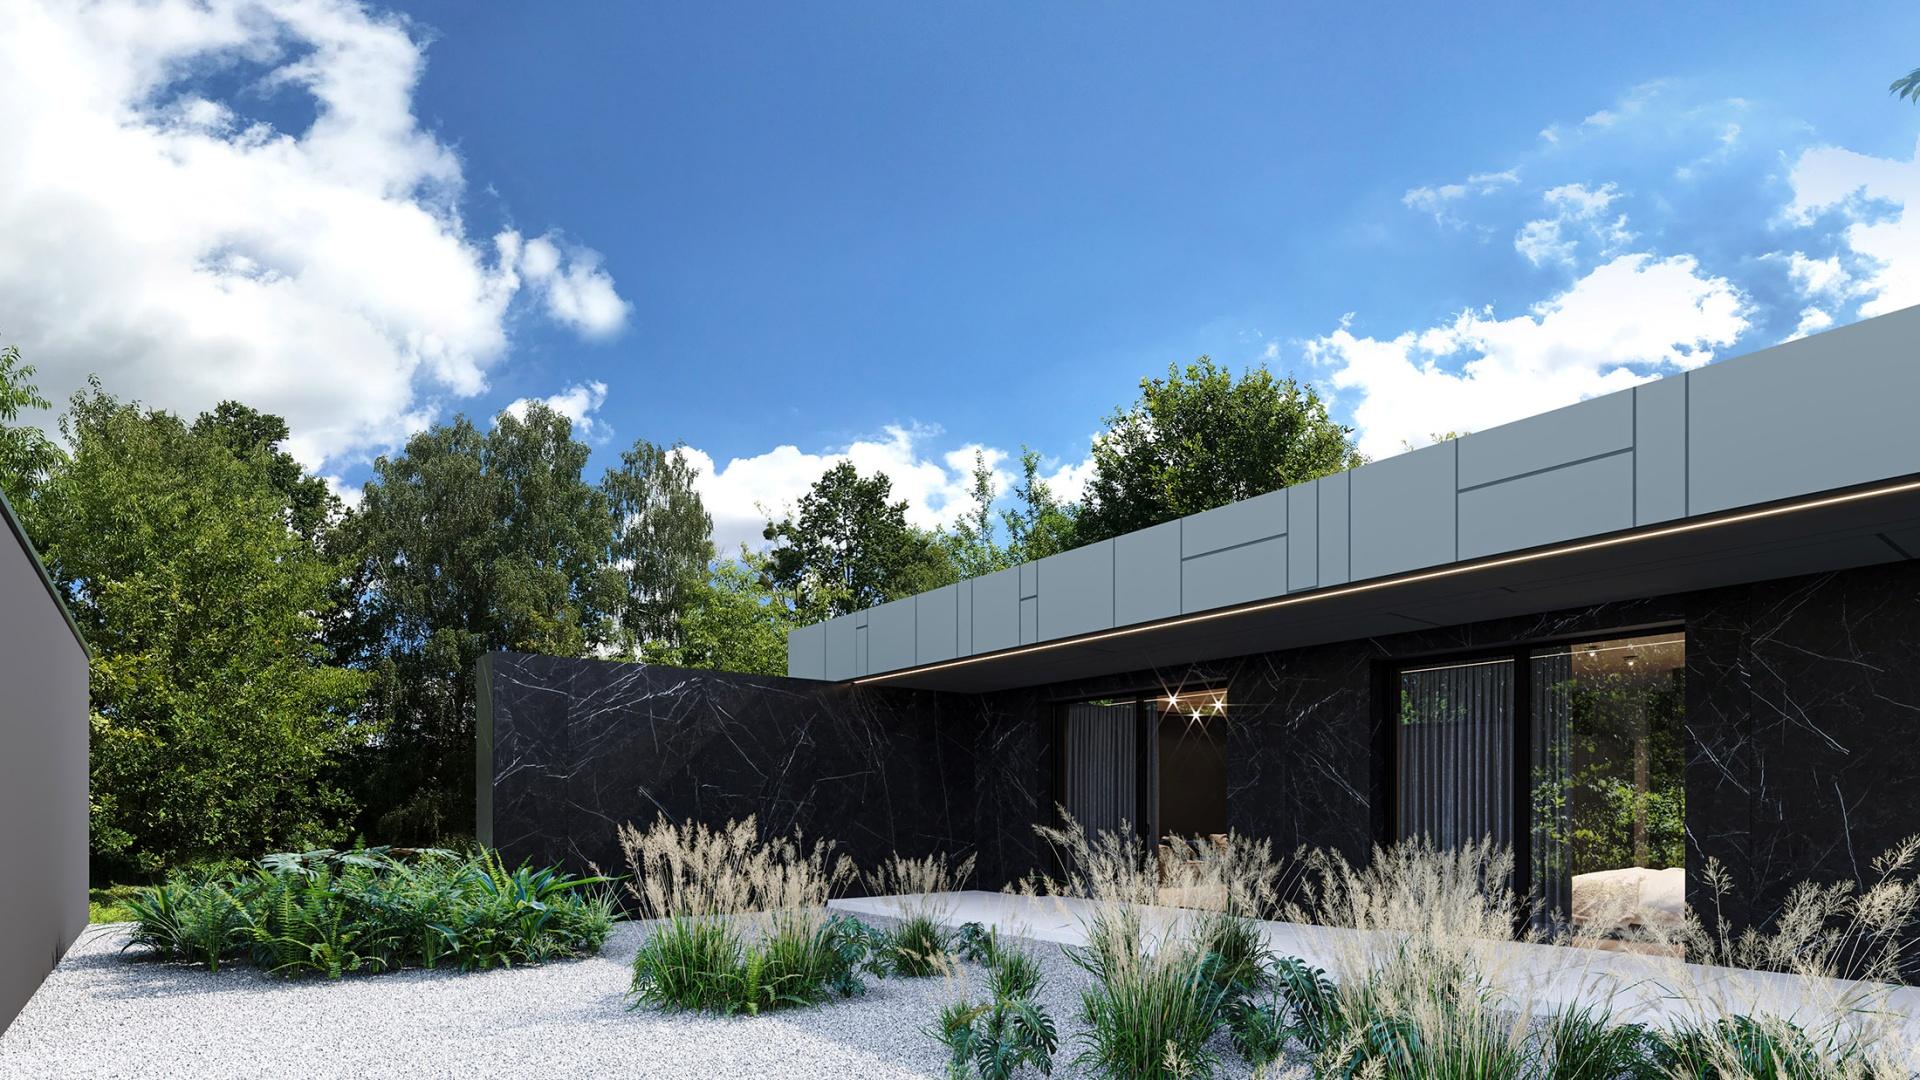 RE: HANGING HOUSE 2.0 projektu architekta Marcina Tomaszewskiego REFORM Architekt